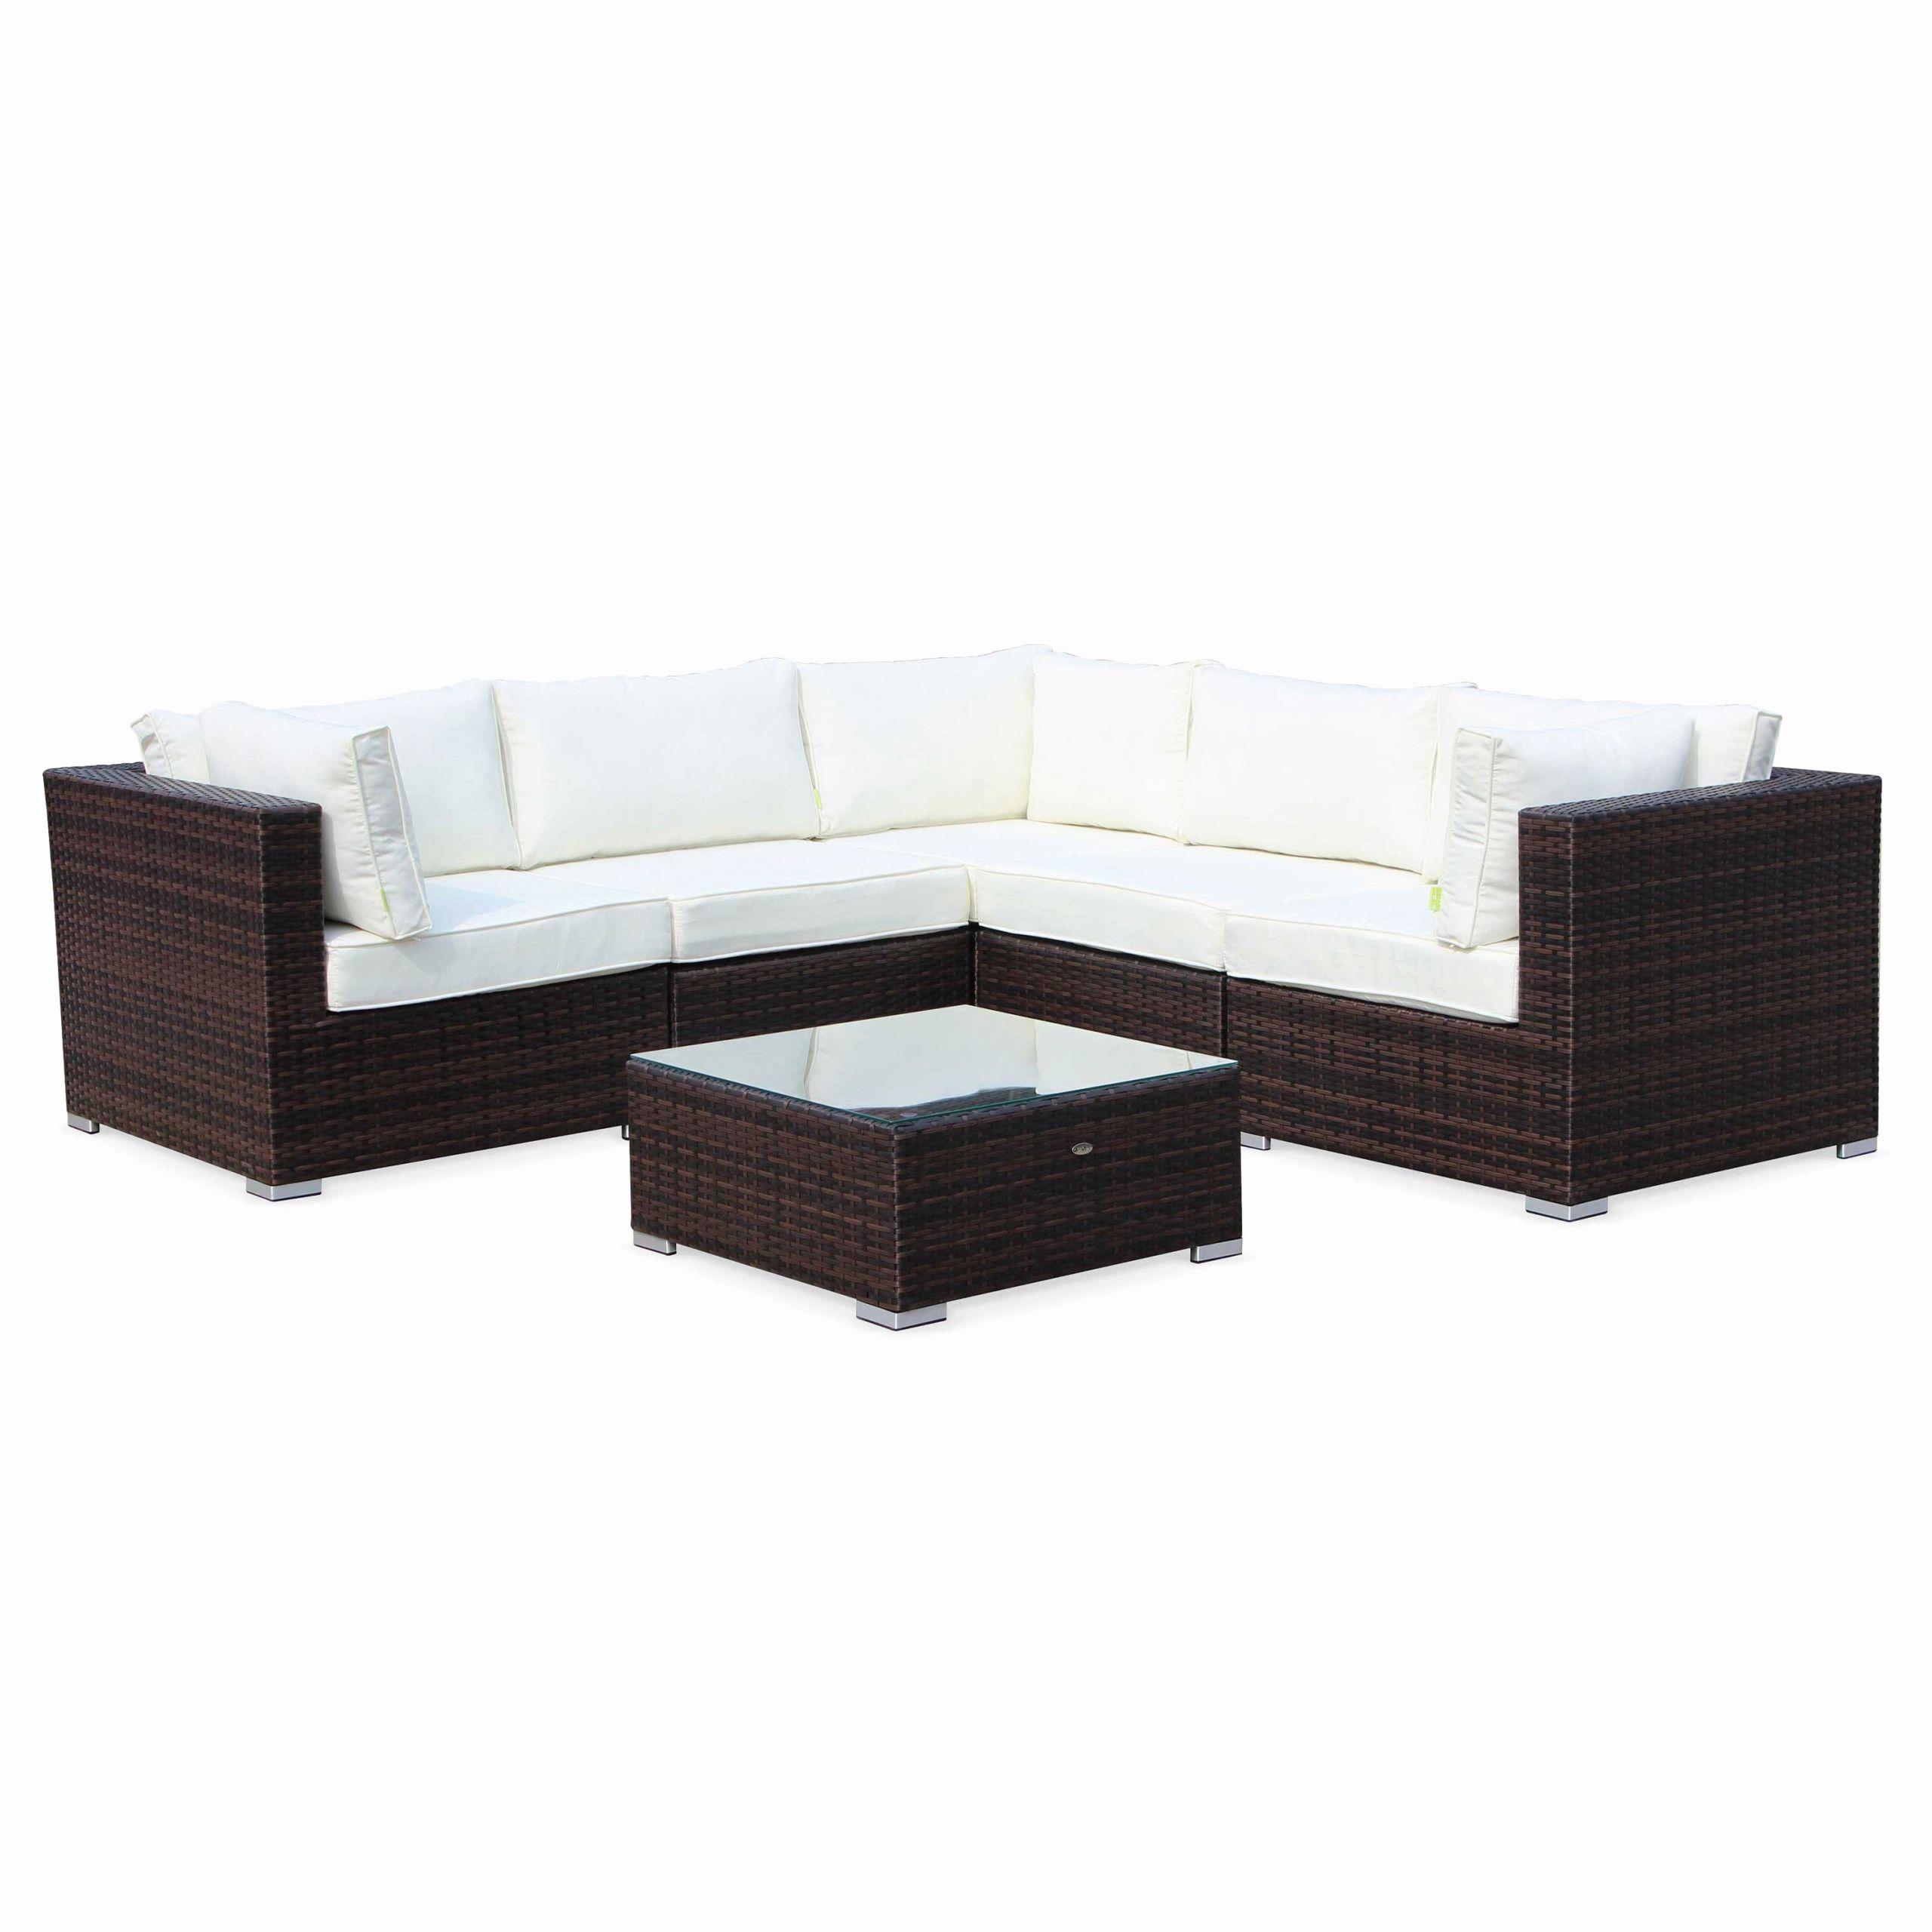 beton cire salon luxe 87 schc2a8me table basse beton cire of beton cire salon